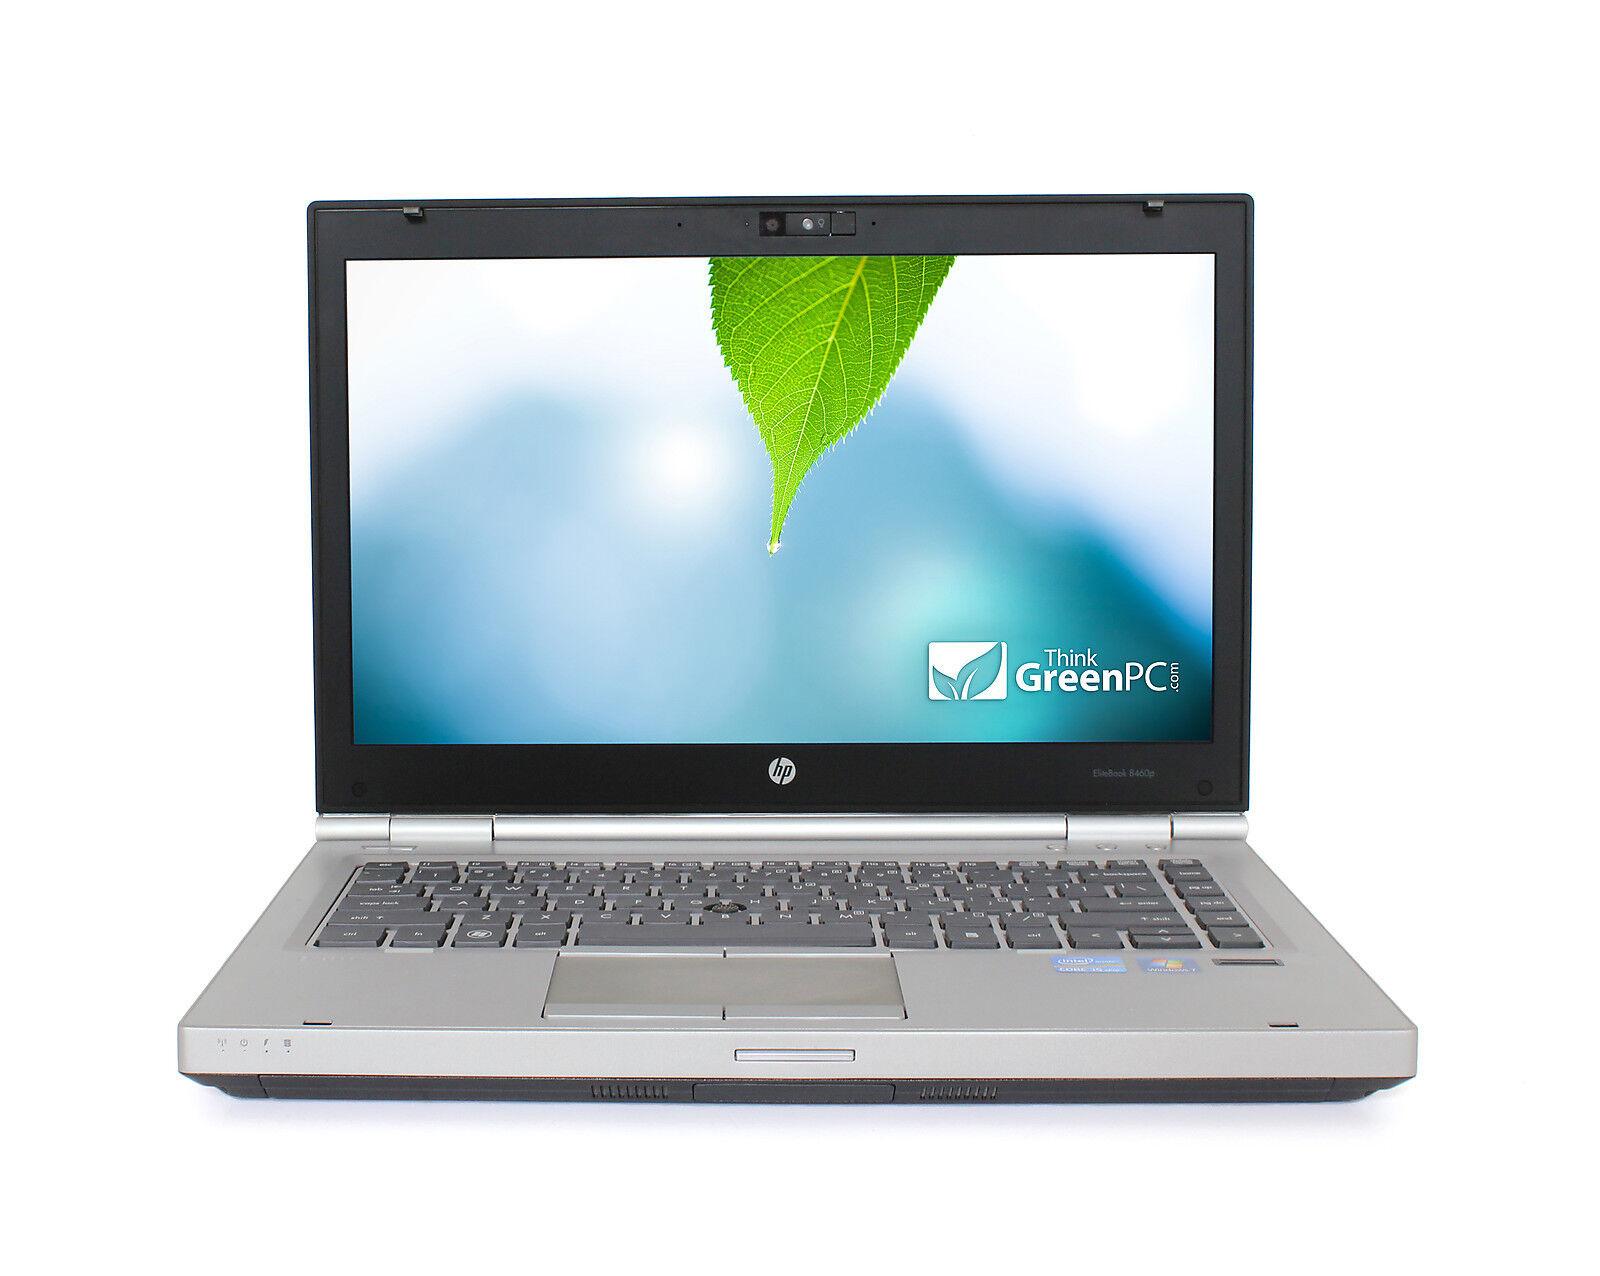 "HP 8470P 14"" Laptop Windows 10 Dual Core 3rd Gen i5 2.6Ghz 4GB RAM 320GB HD WiFi"